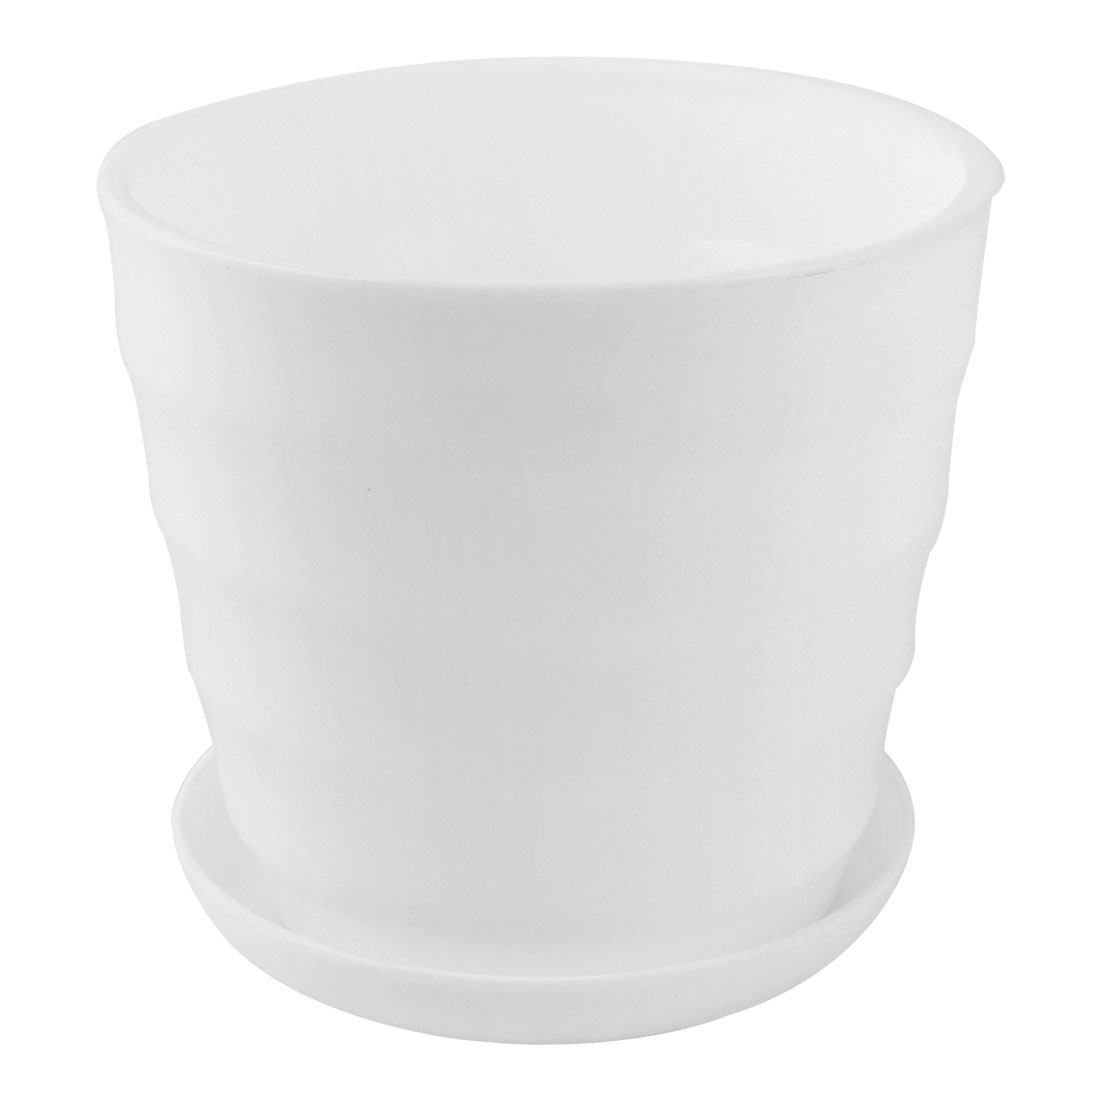 Home Garden Office Desk Plastic Round Plant Planter Flower Pot White 5 Inch Dia